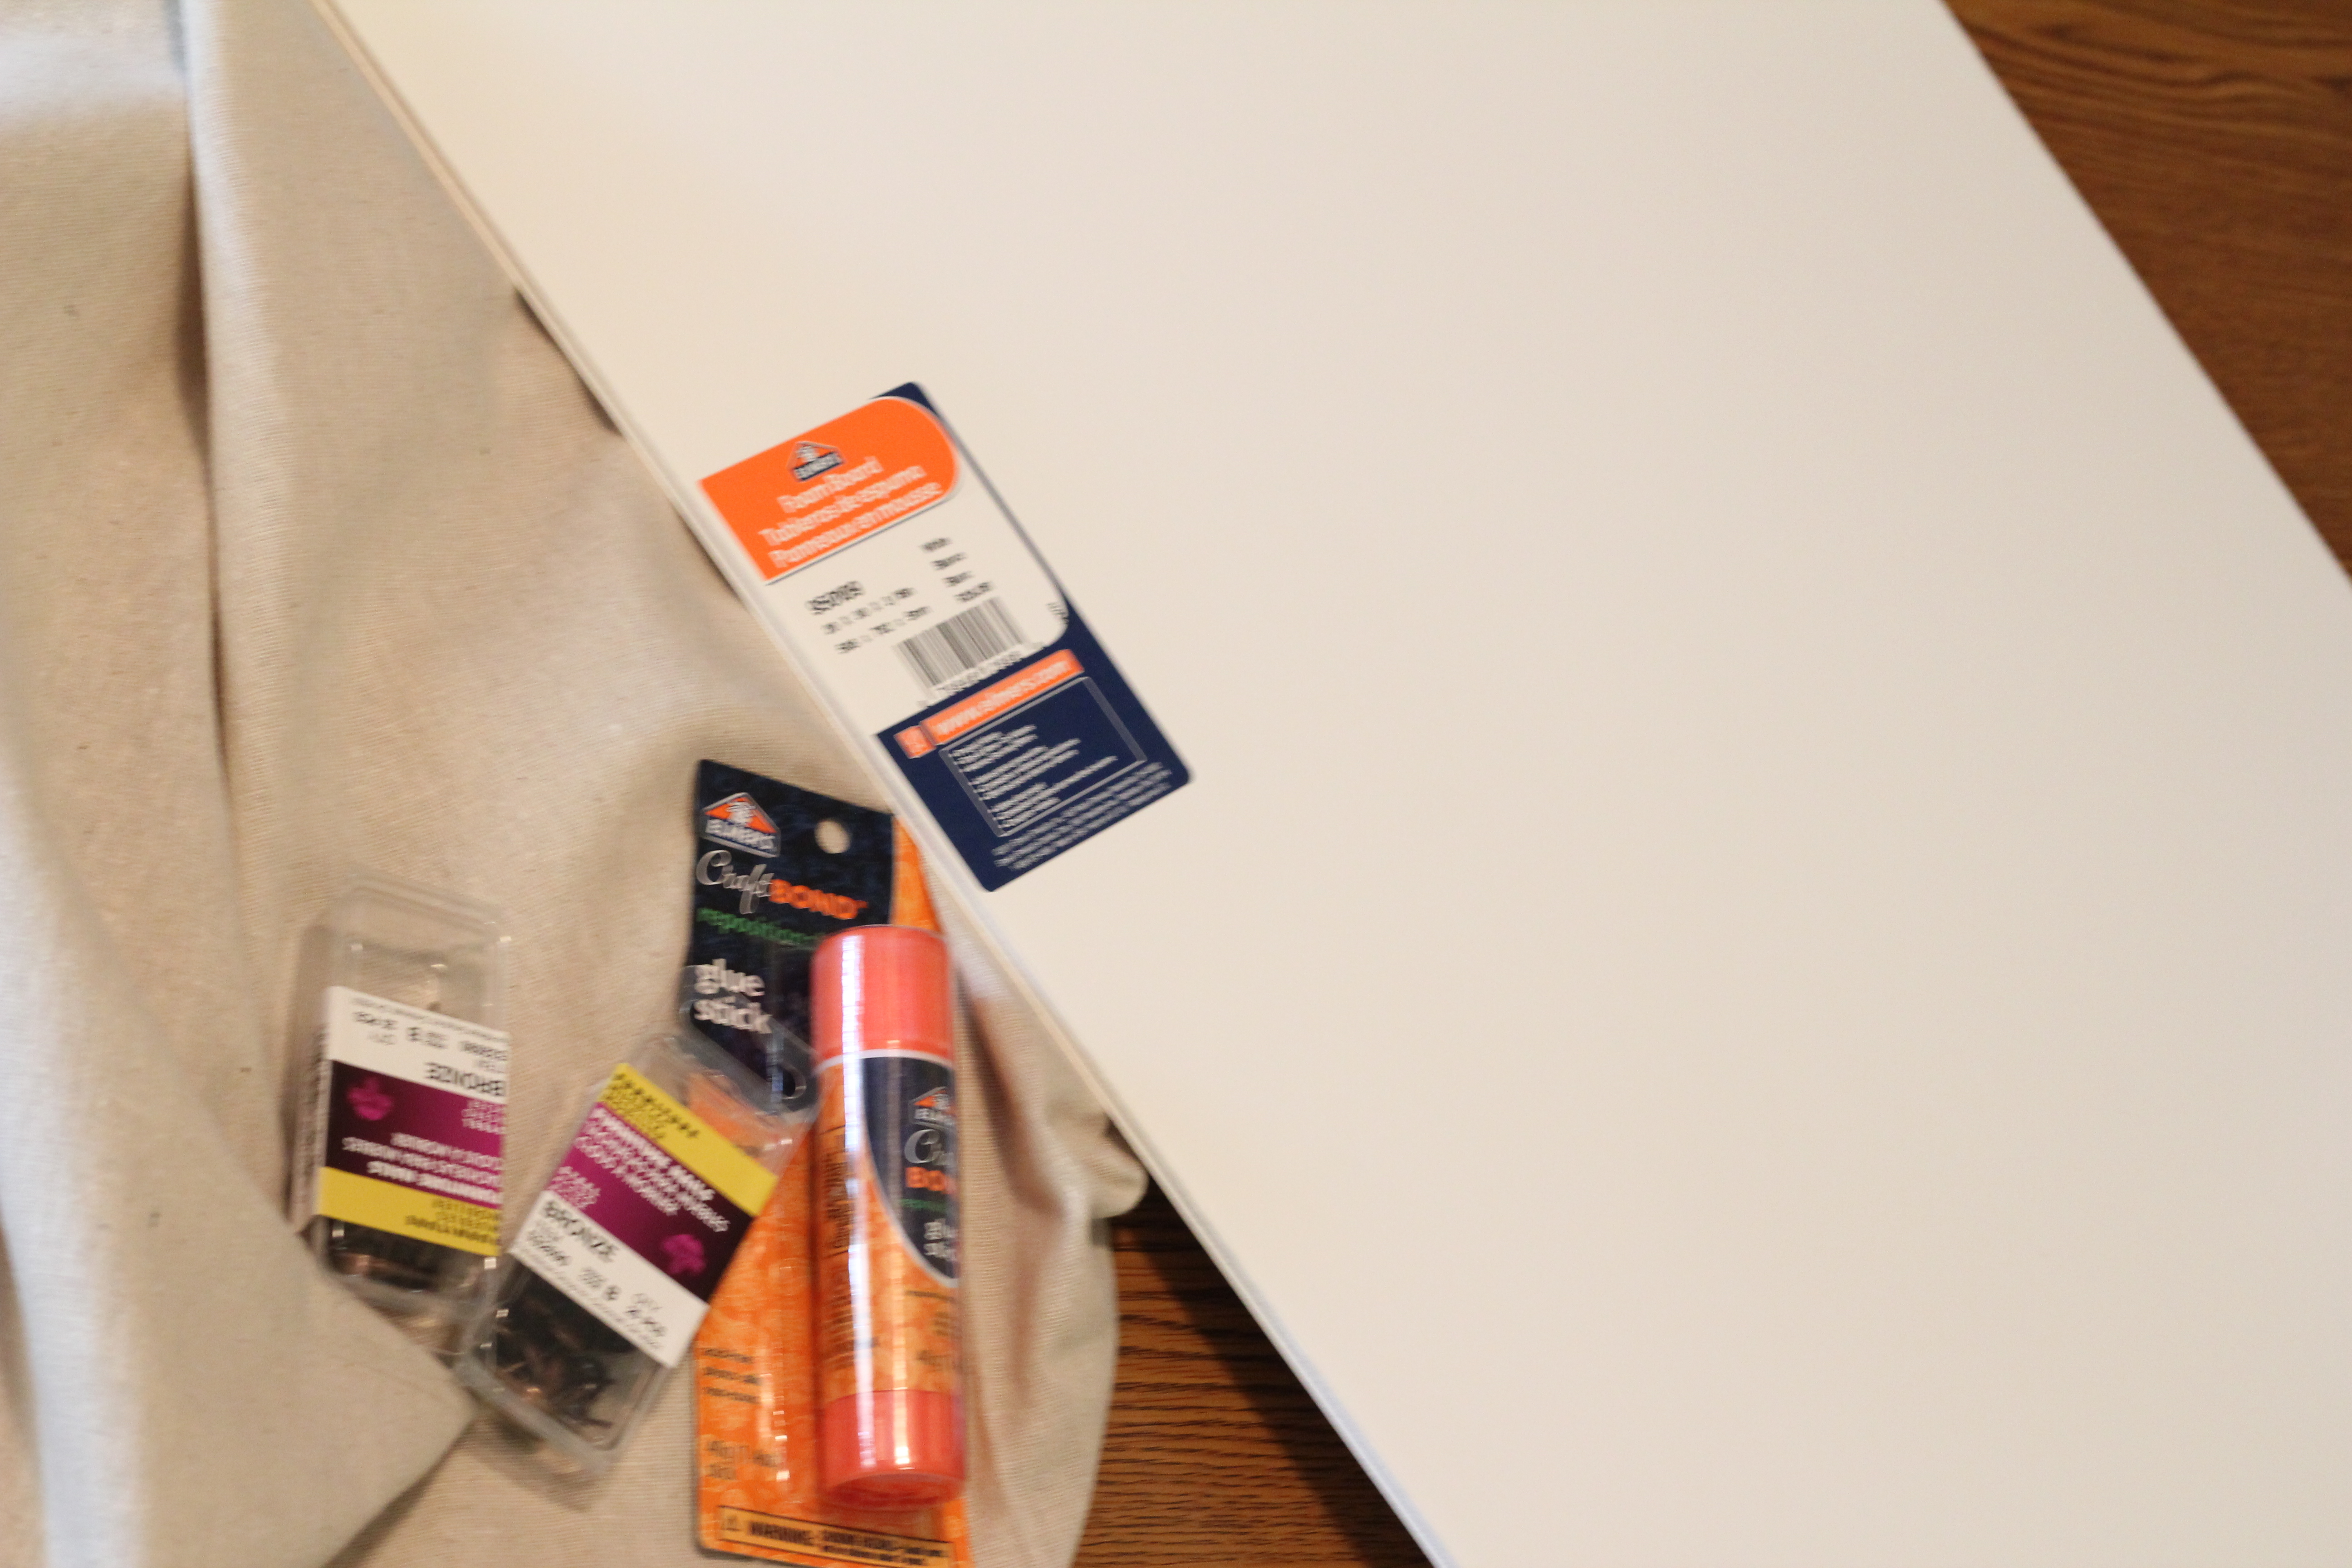 Elmer S Craft Bond Hot Glue Stick